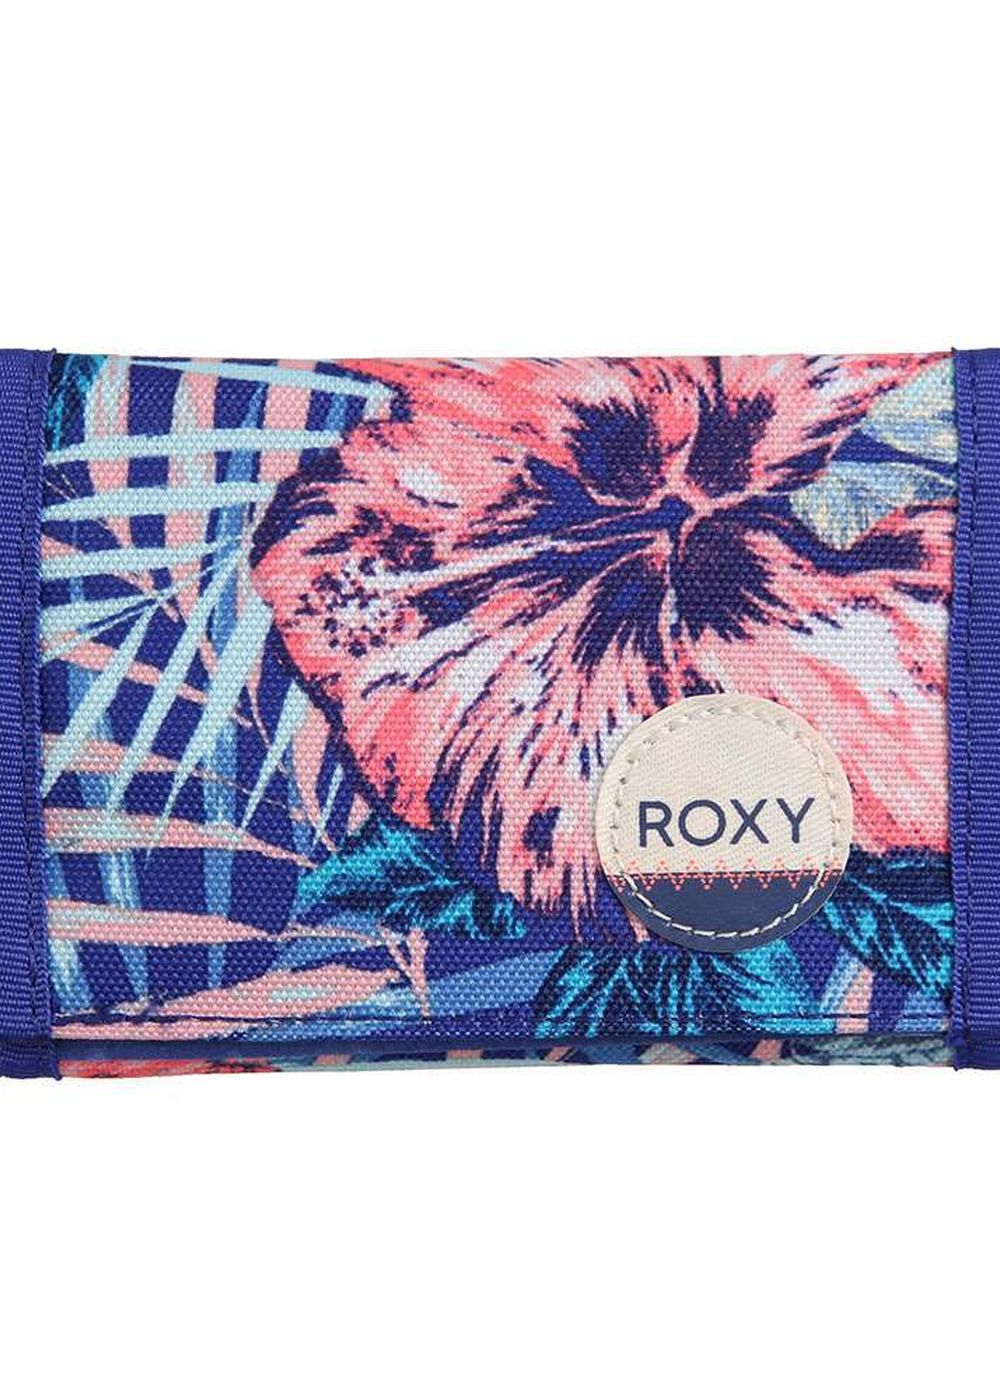 roxy small beach wallet royal blue